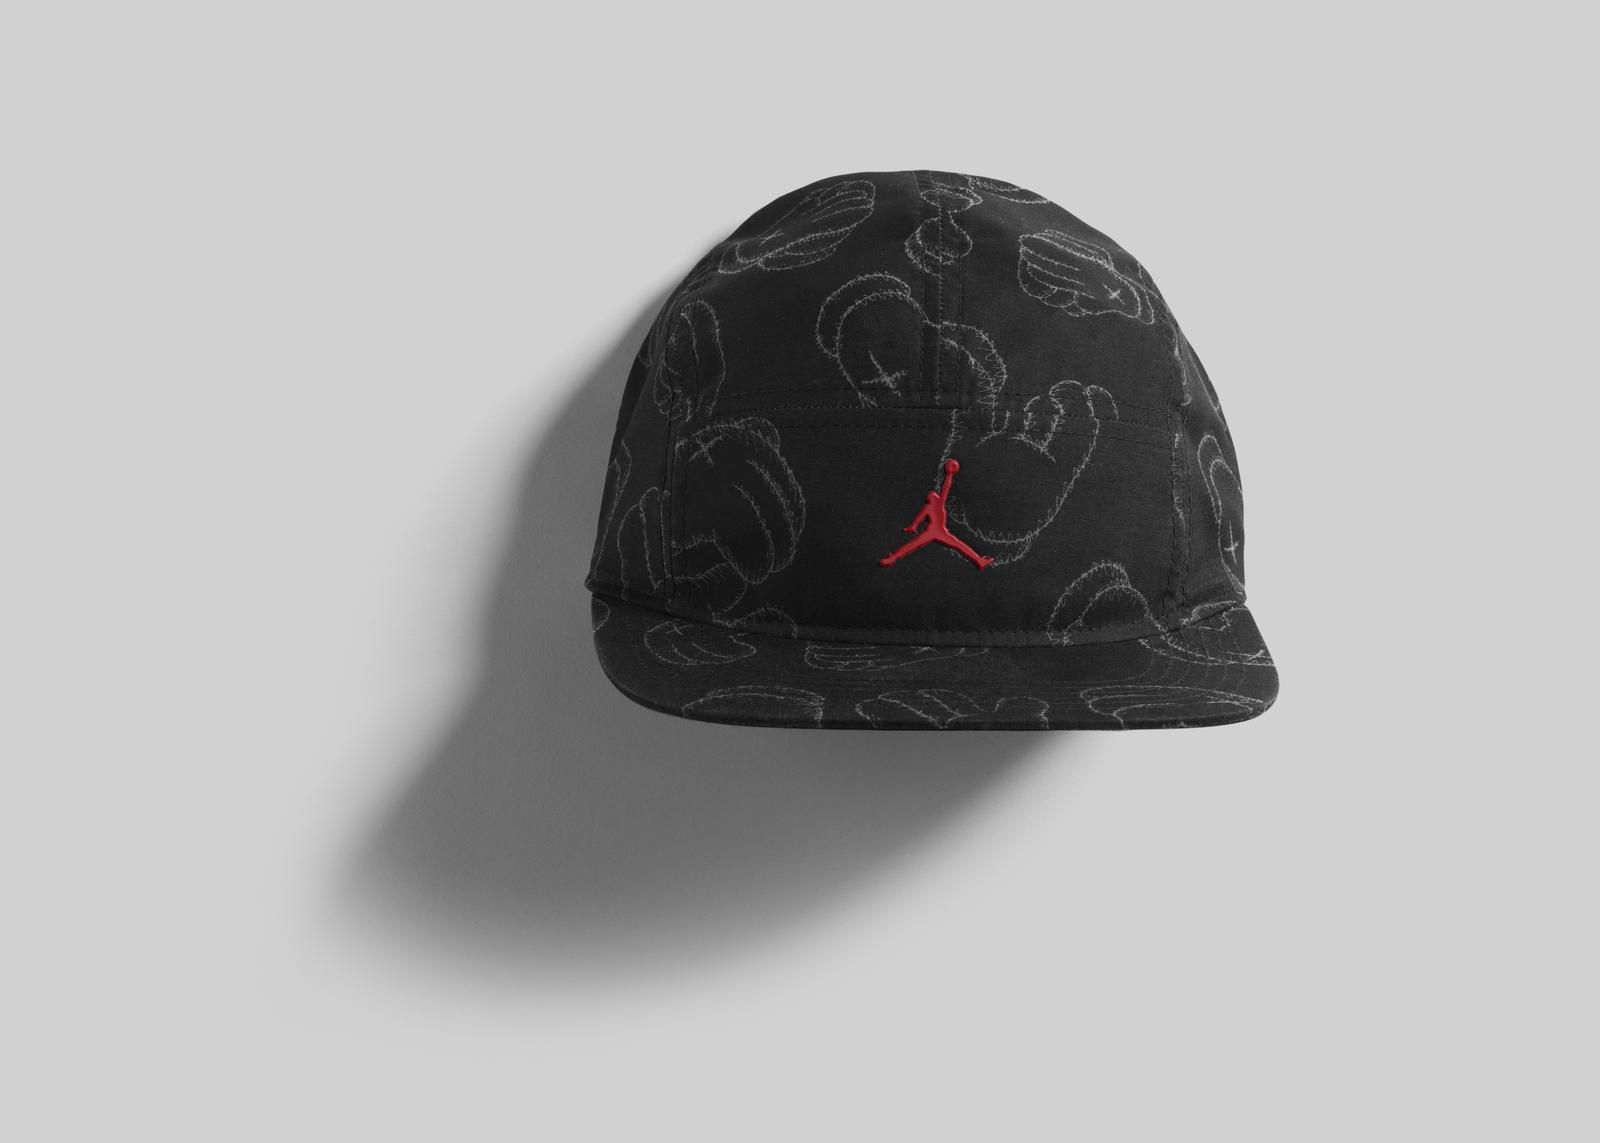 ea4dabf5a14 Jordan x KAWS Capsule - Nike News